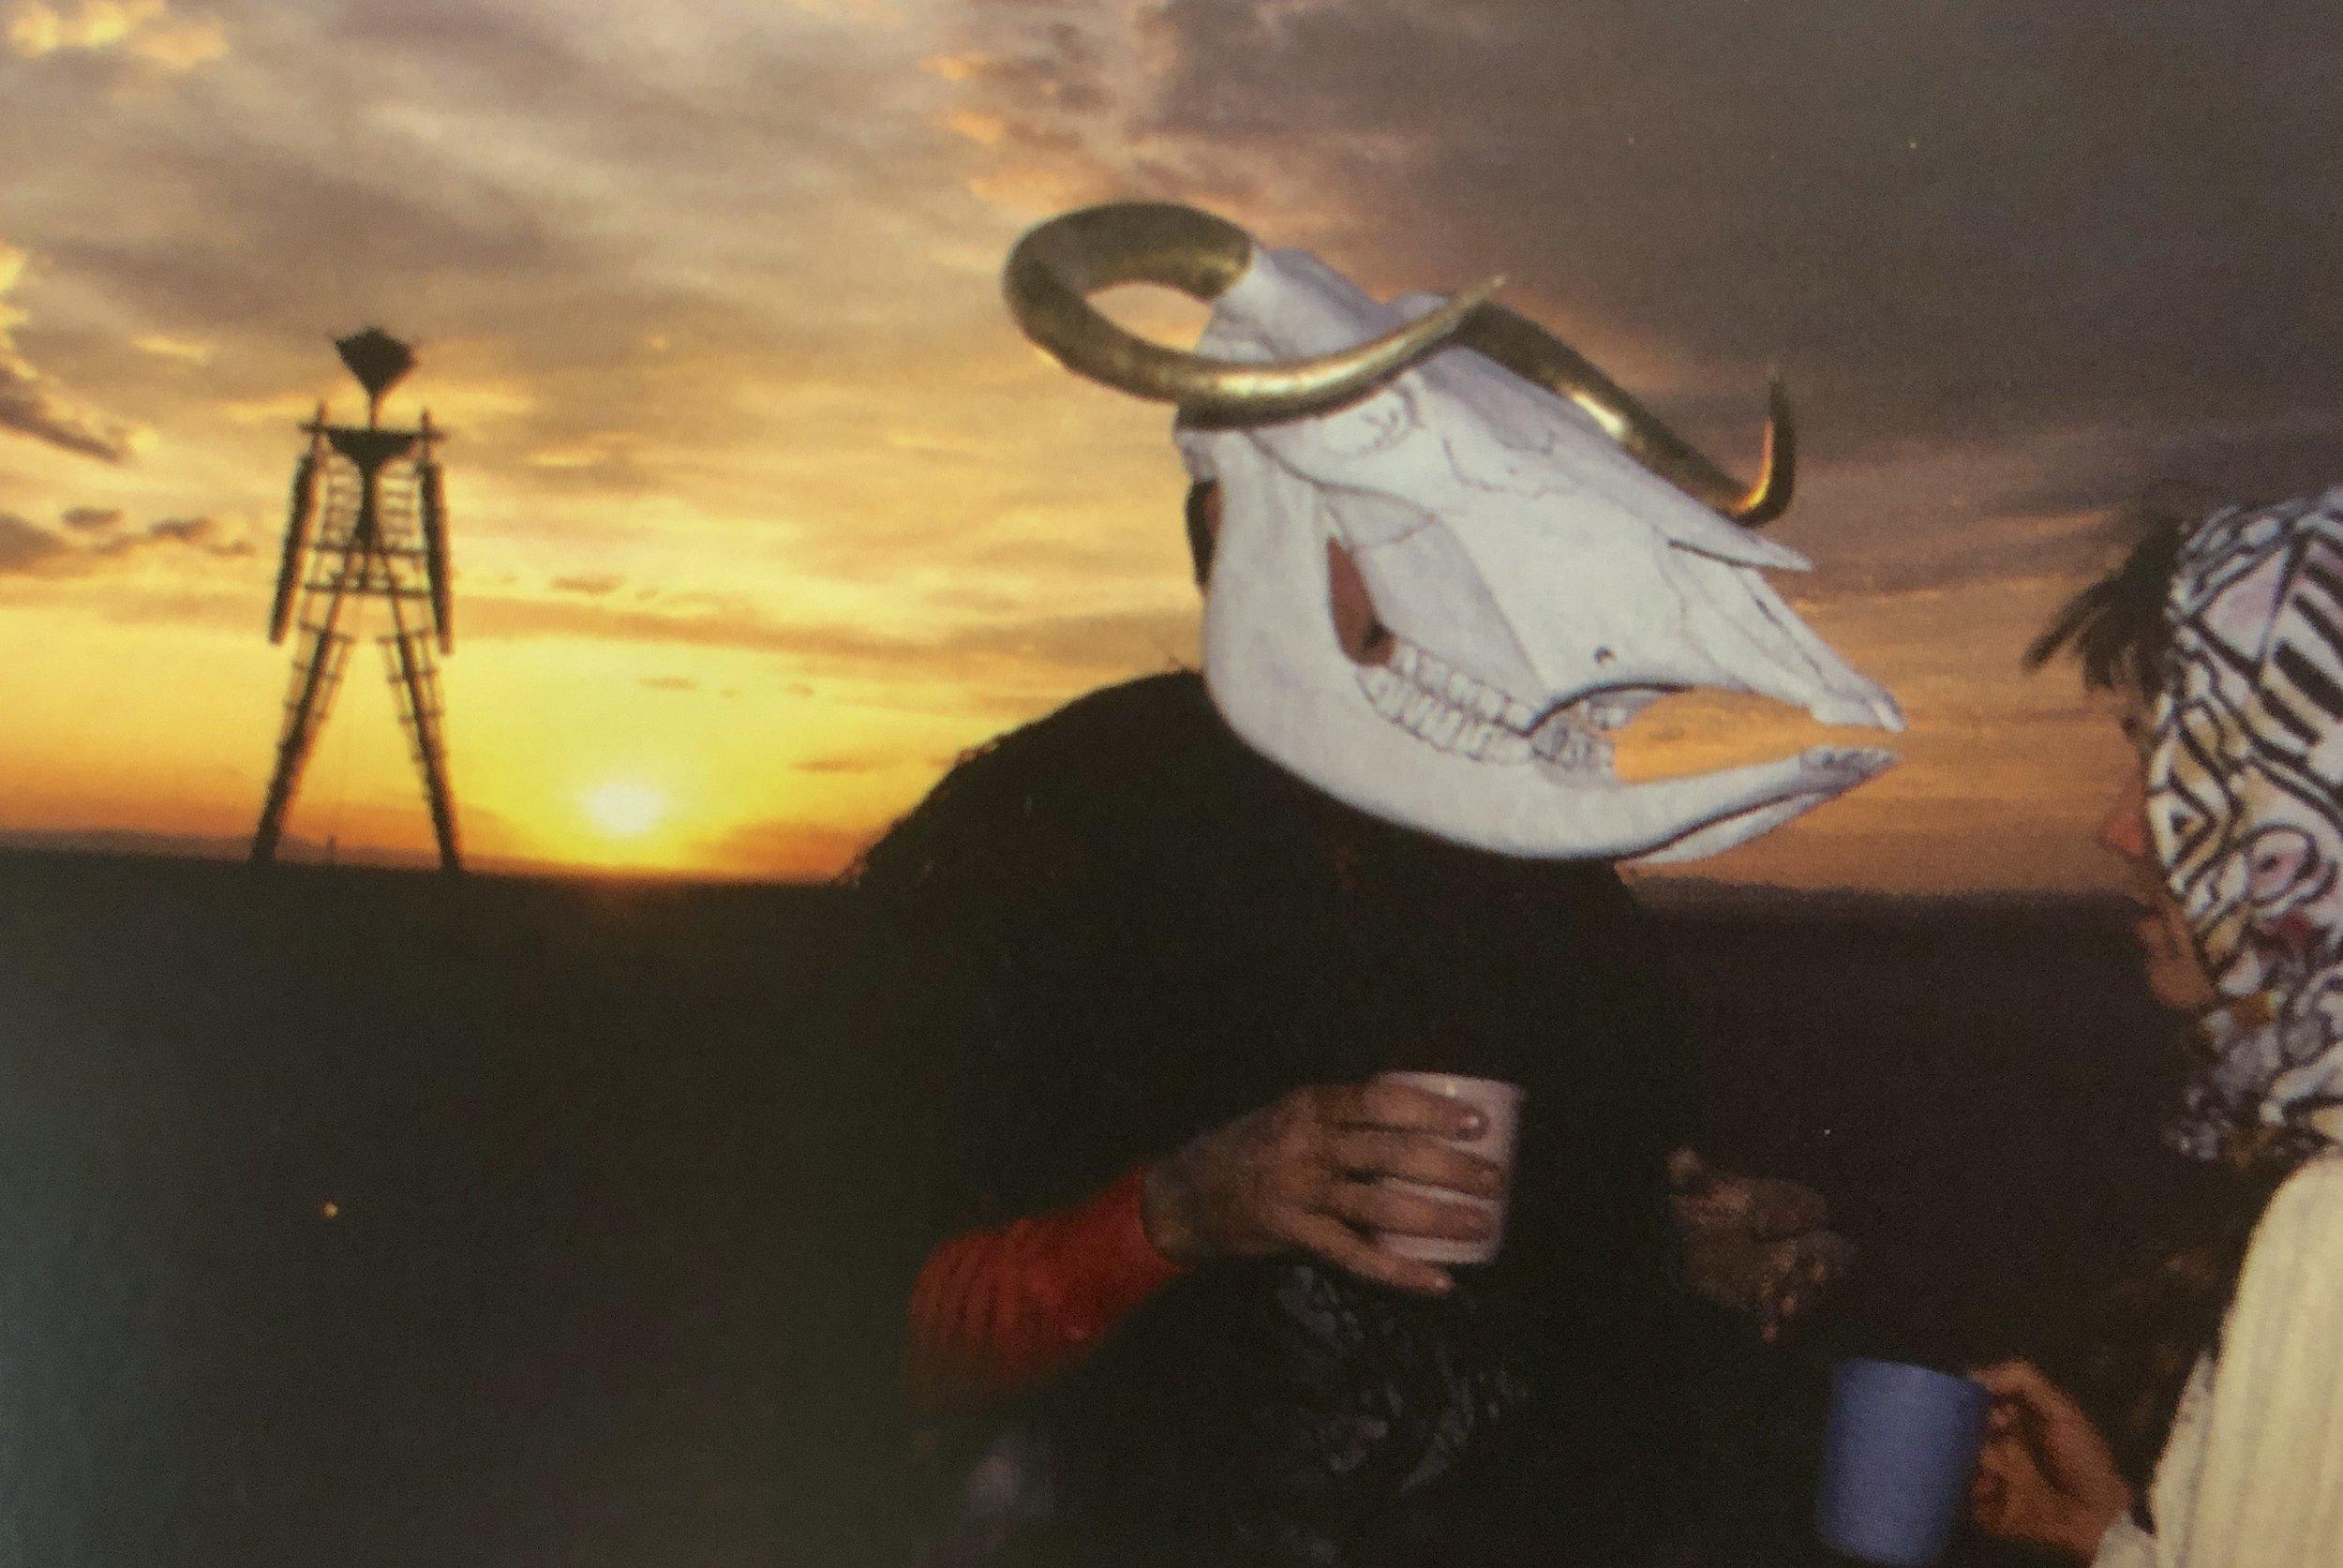 Java Cow - A Burning Man Ritual